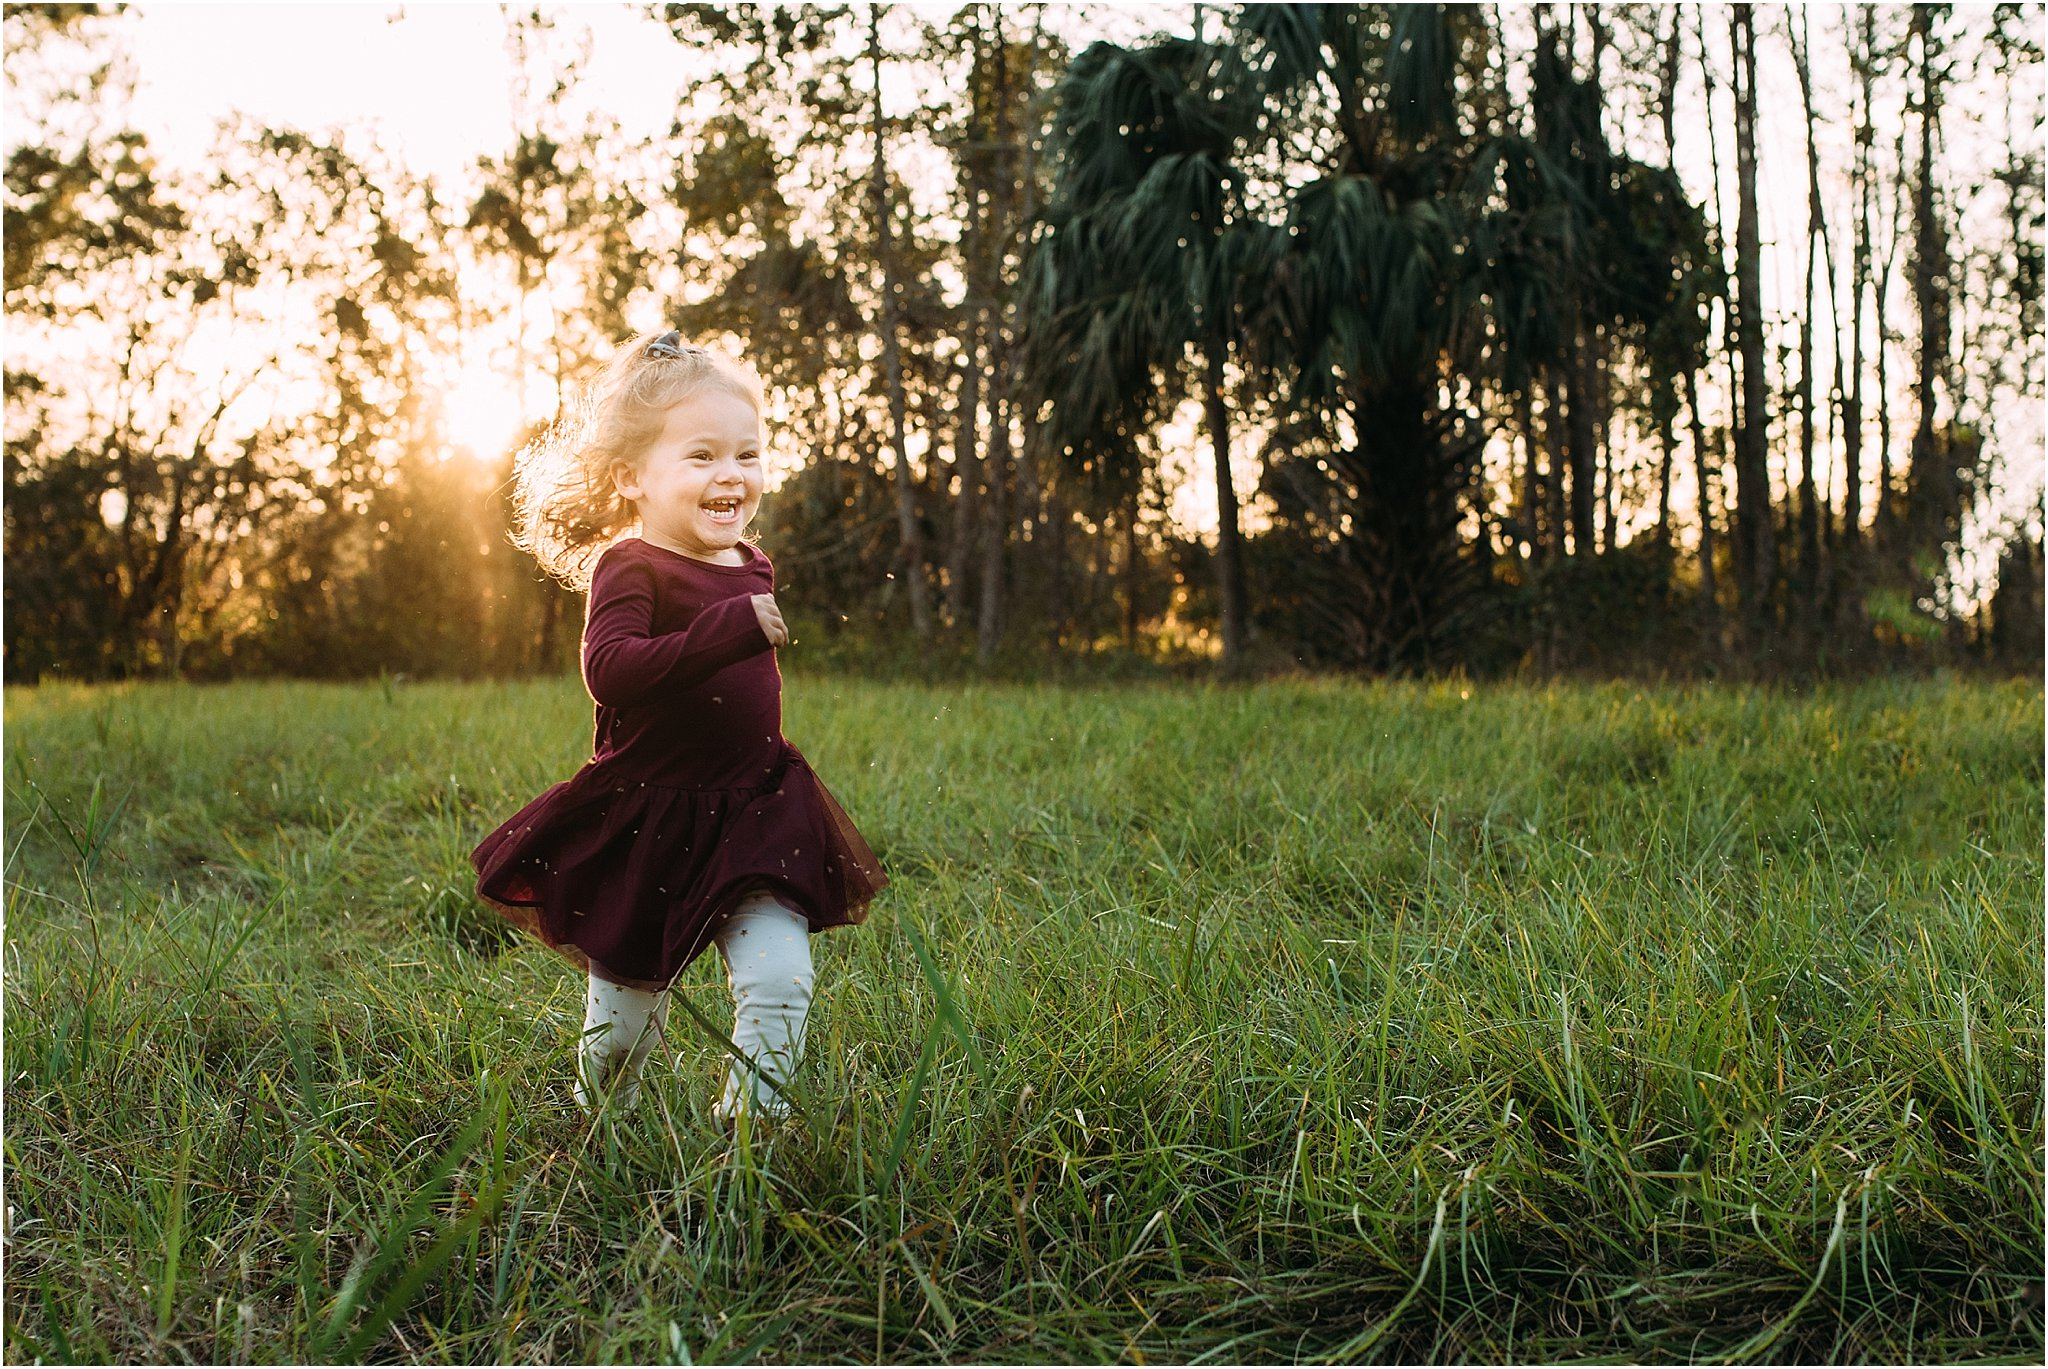 Ashley_Rogers_Photography_Orlando_Non-Posed_Newborn_Family_Lifestyle_Photographer_0212.jpg